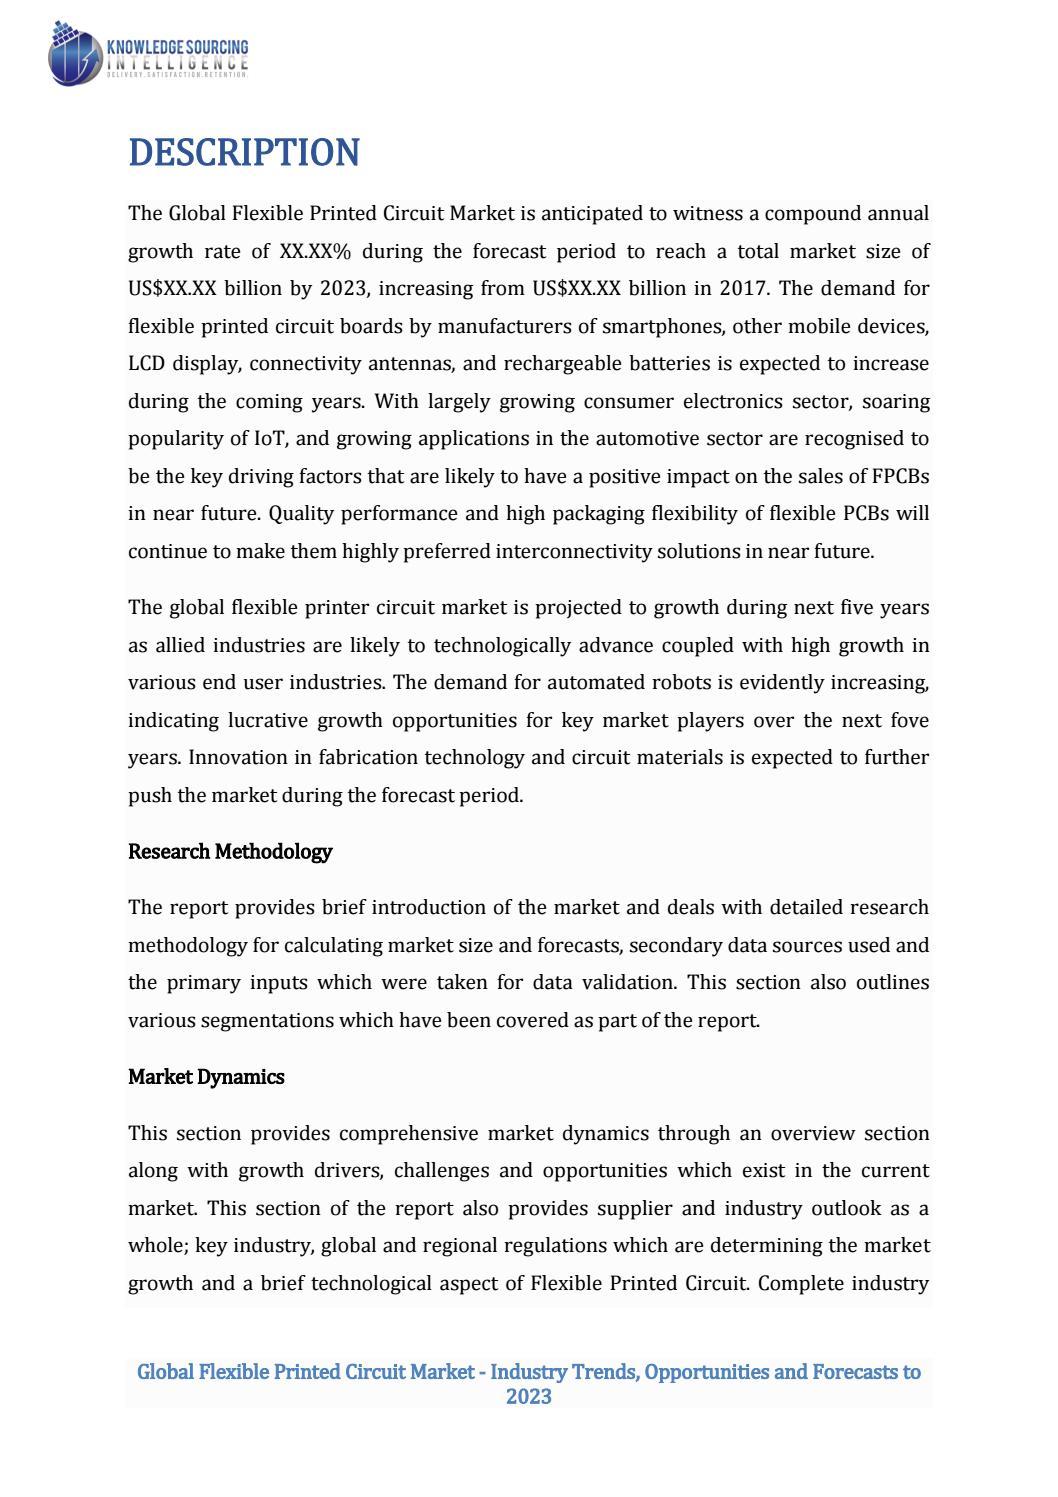 Global flexible printed circuit market by Pallavi Srivastava